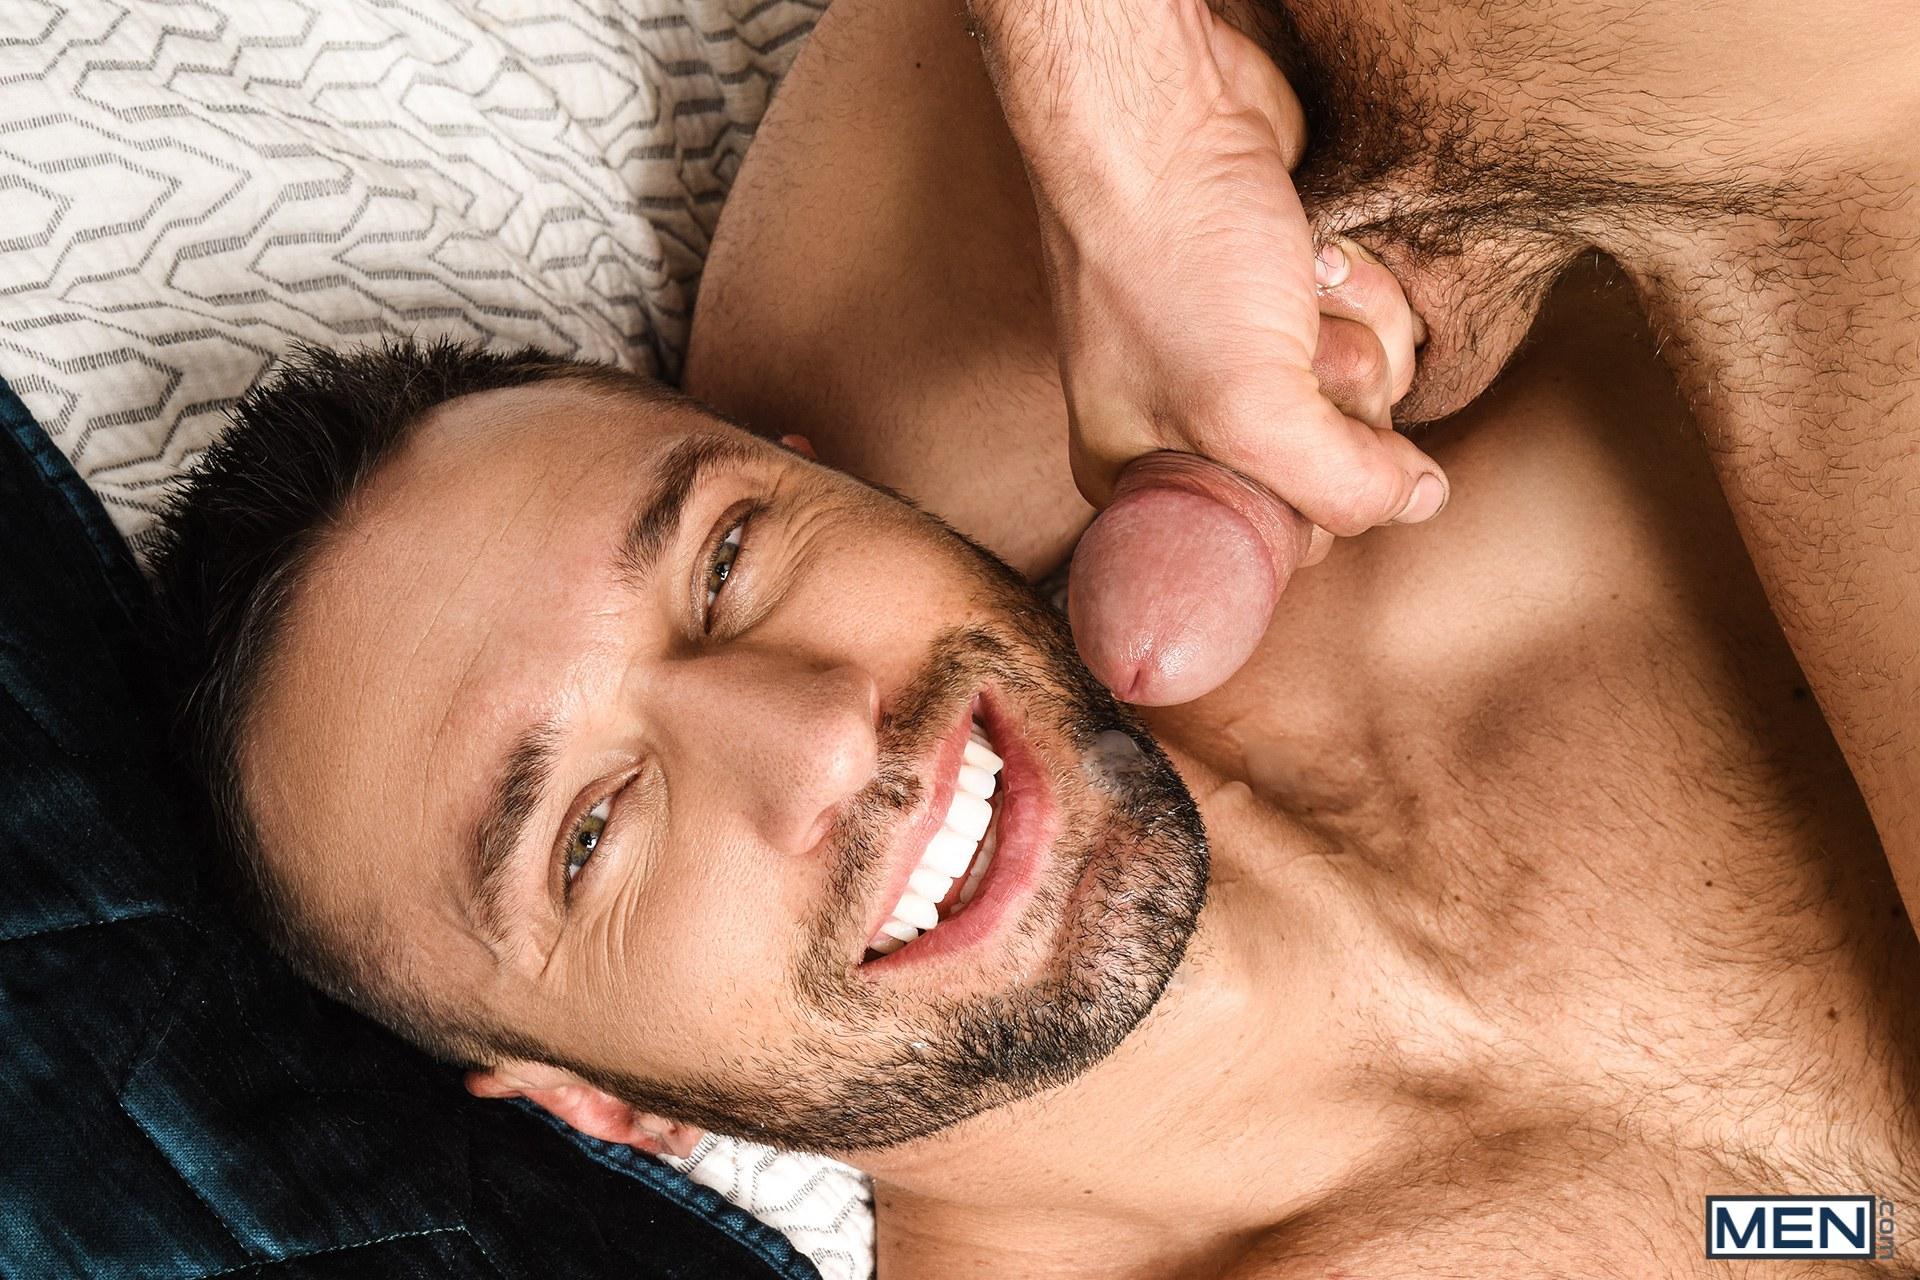 Gay porn star Johnny Rapid fucking Colby Tucker